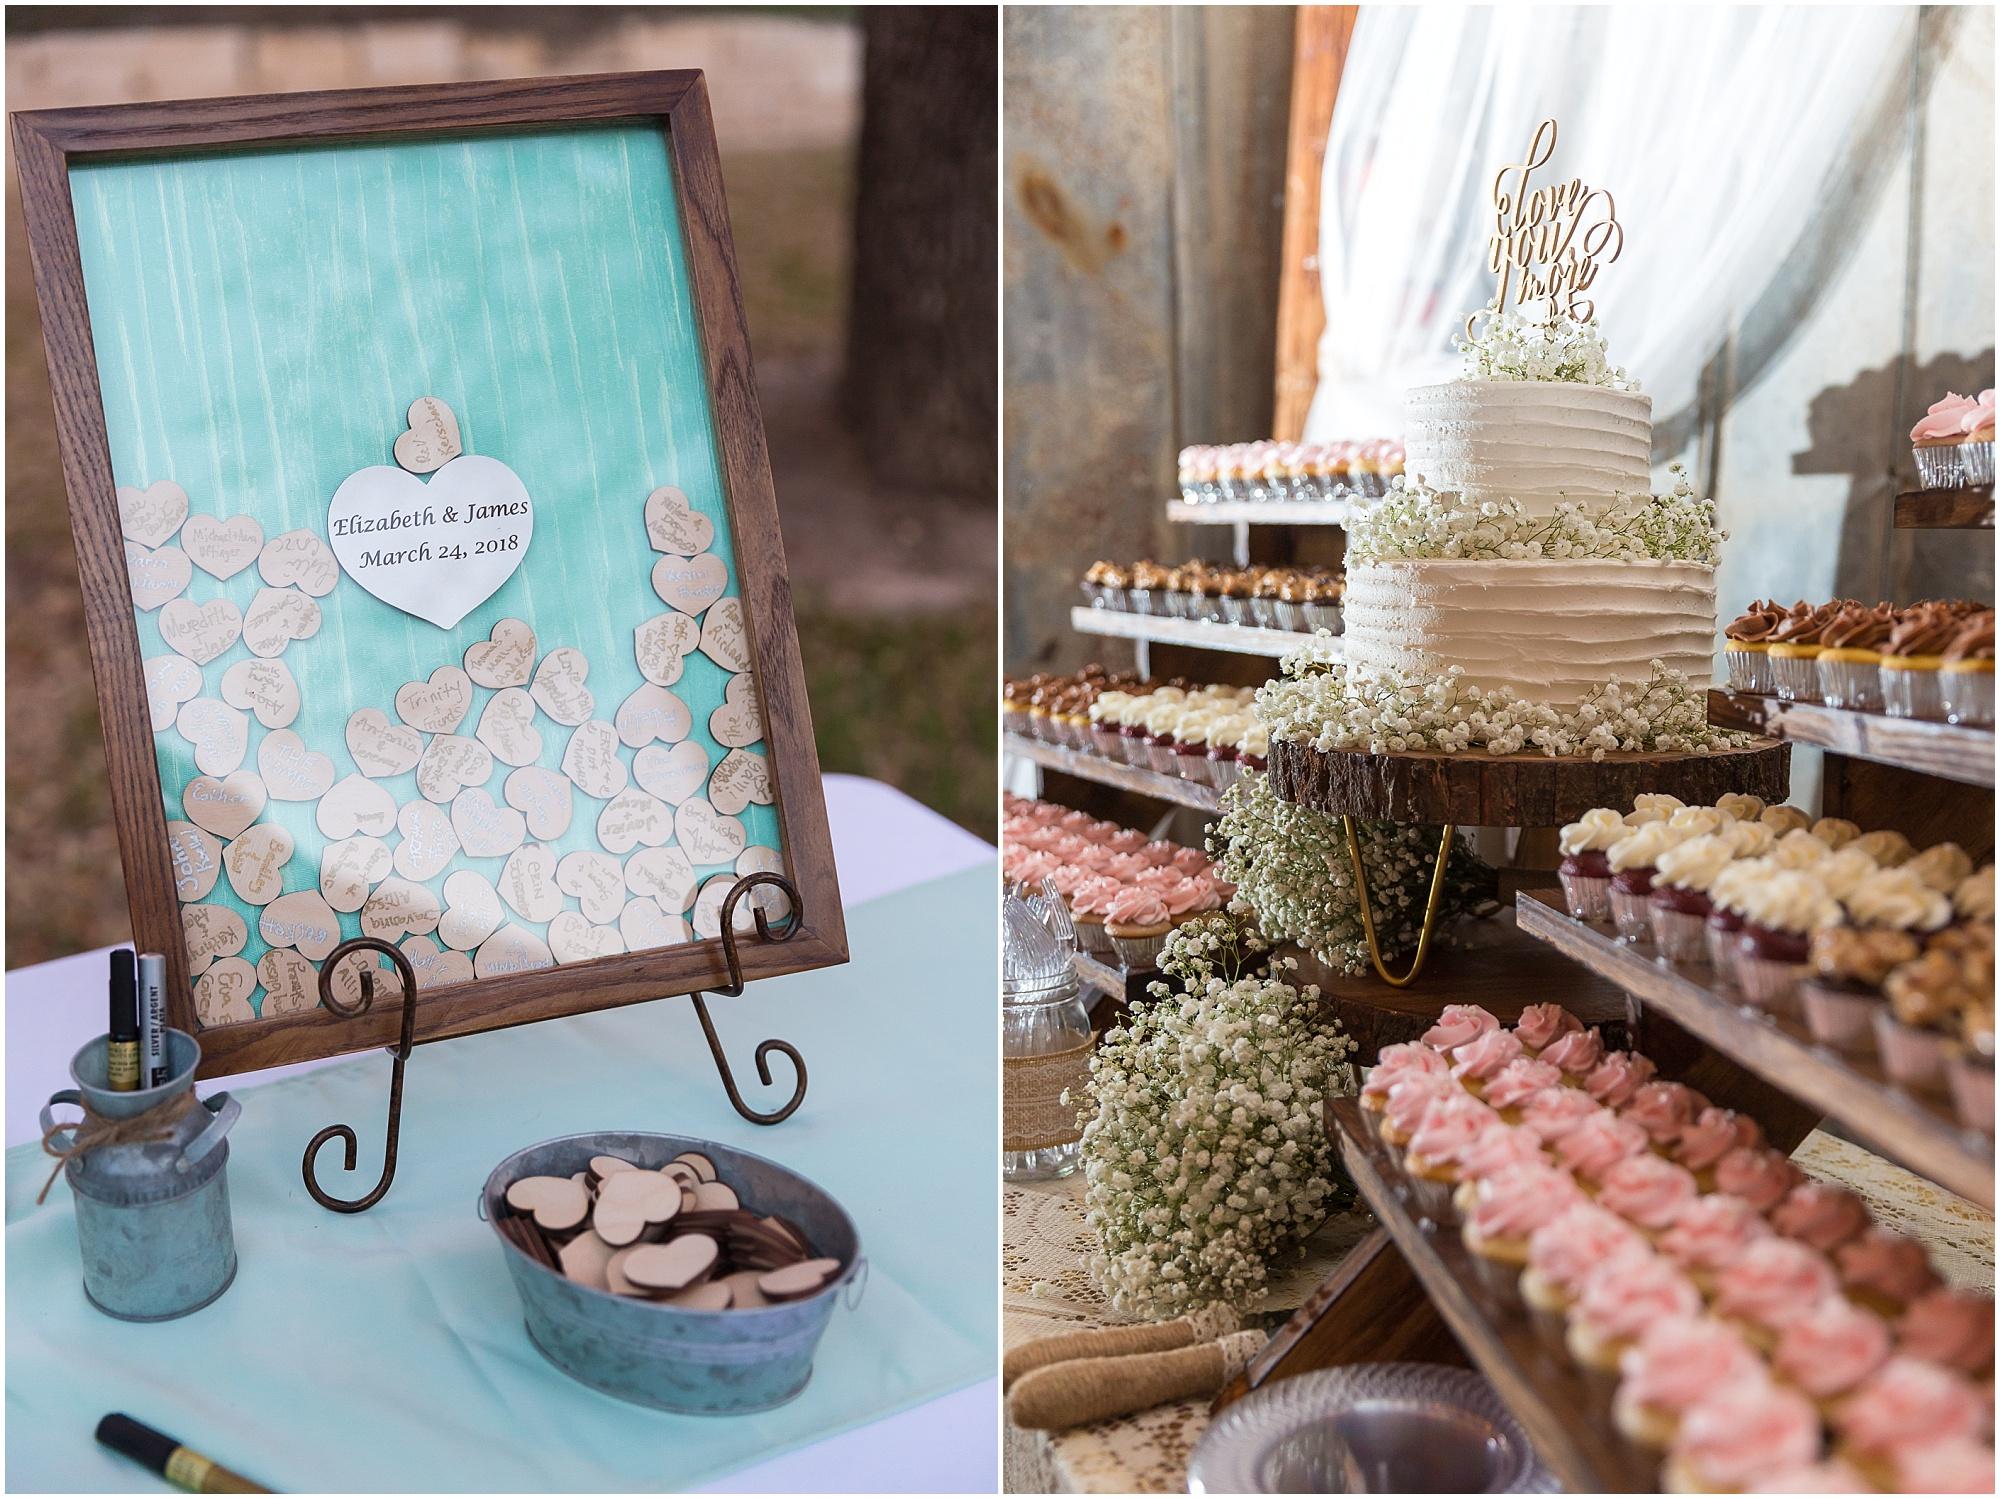 Unique guest book idea at wedding at Peacock River Ranch - Jason & Melaina Photography